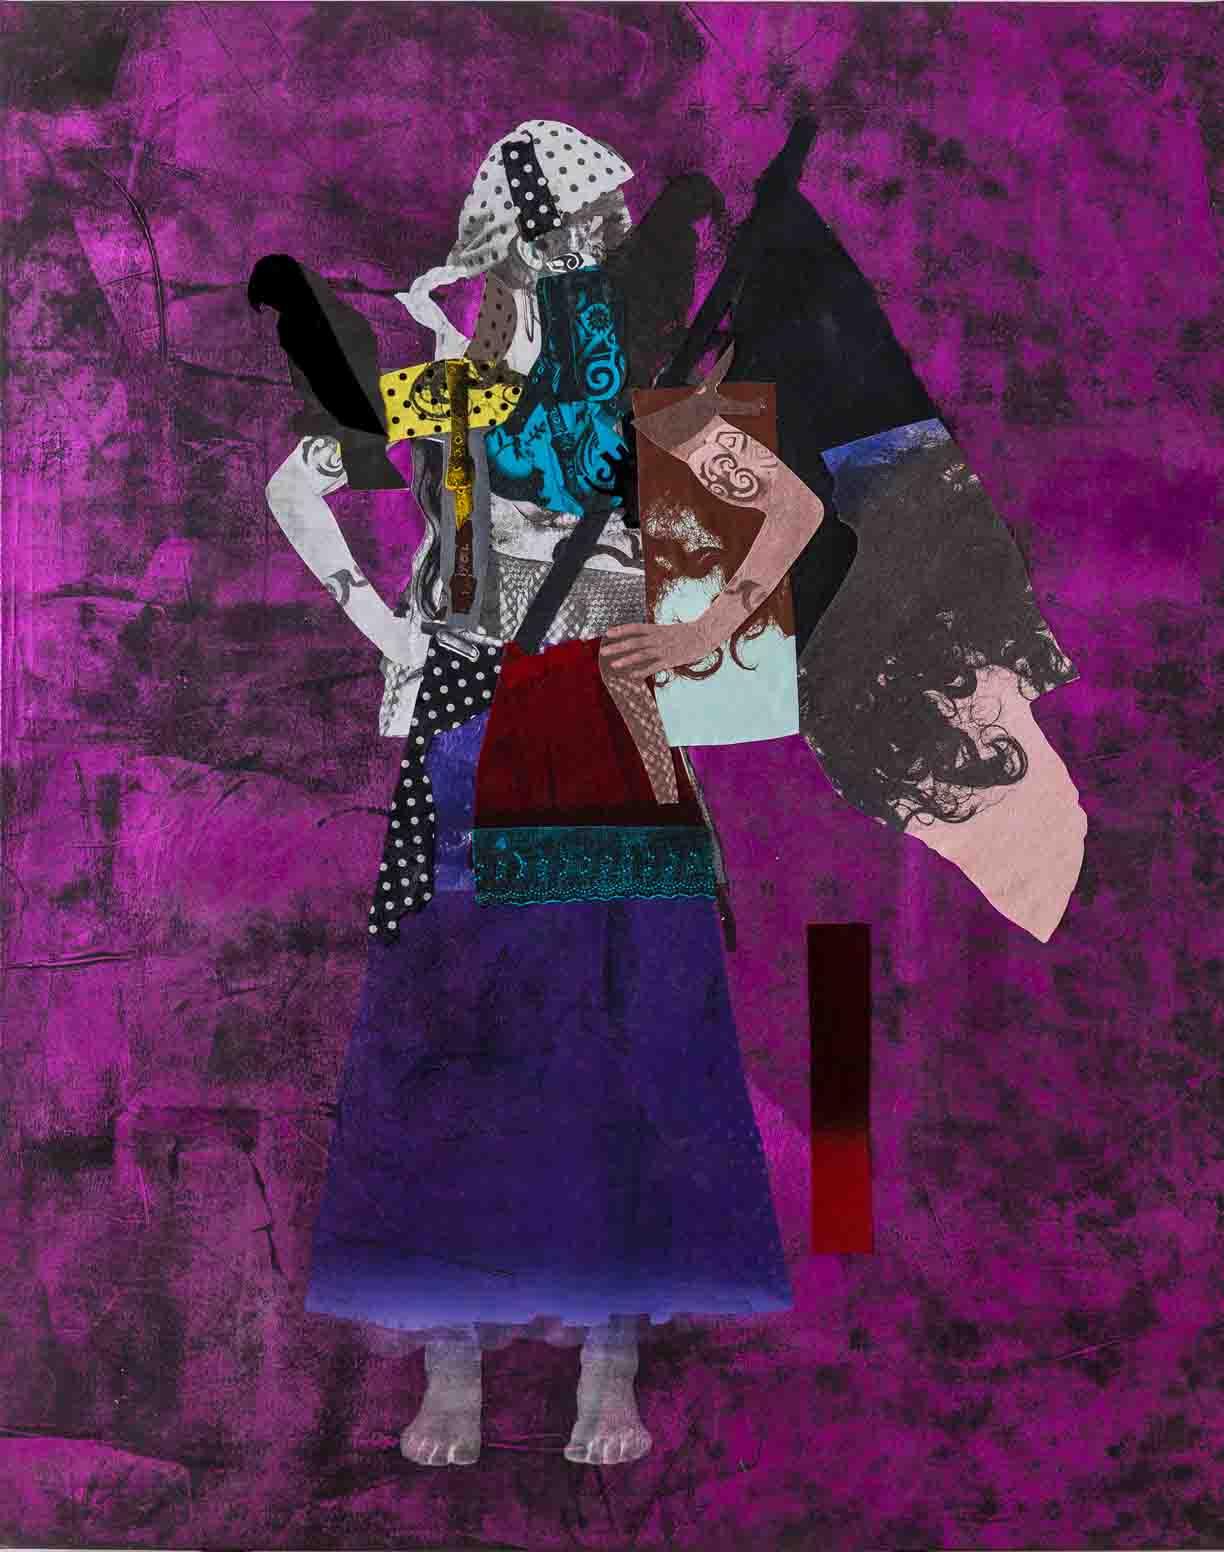 Sally Smart - The Exquisite Pirate  (Rauberromantik)190 x 150 cm